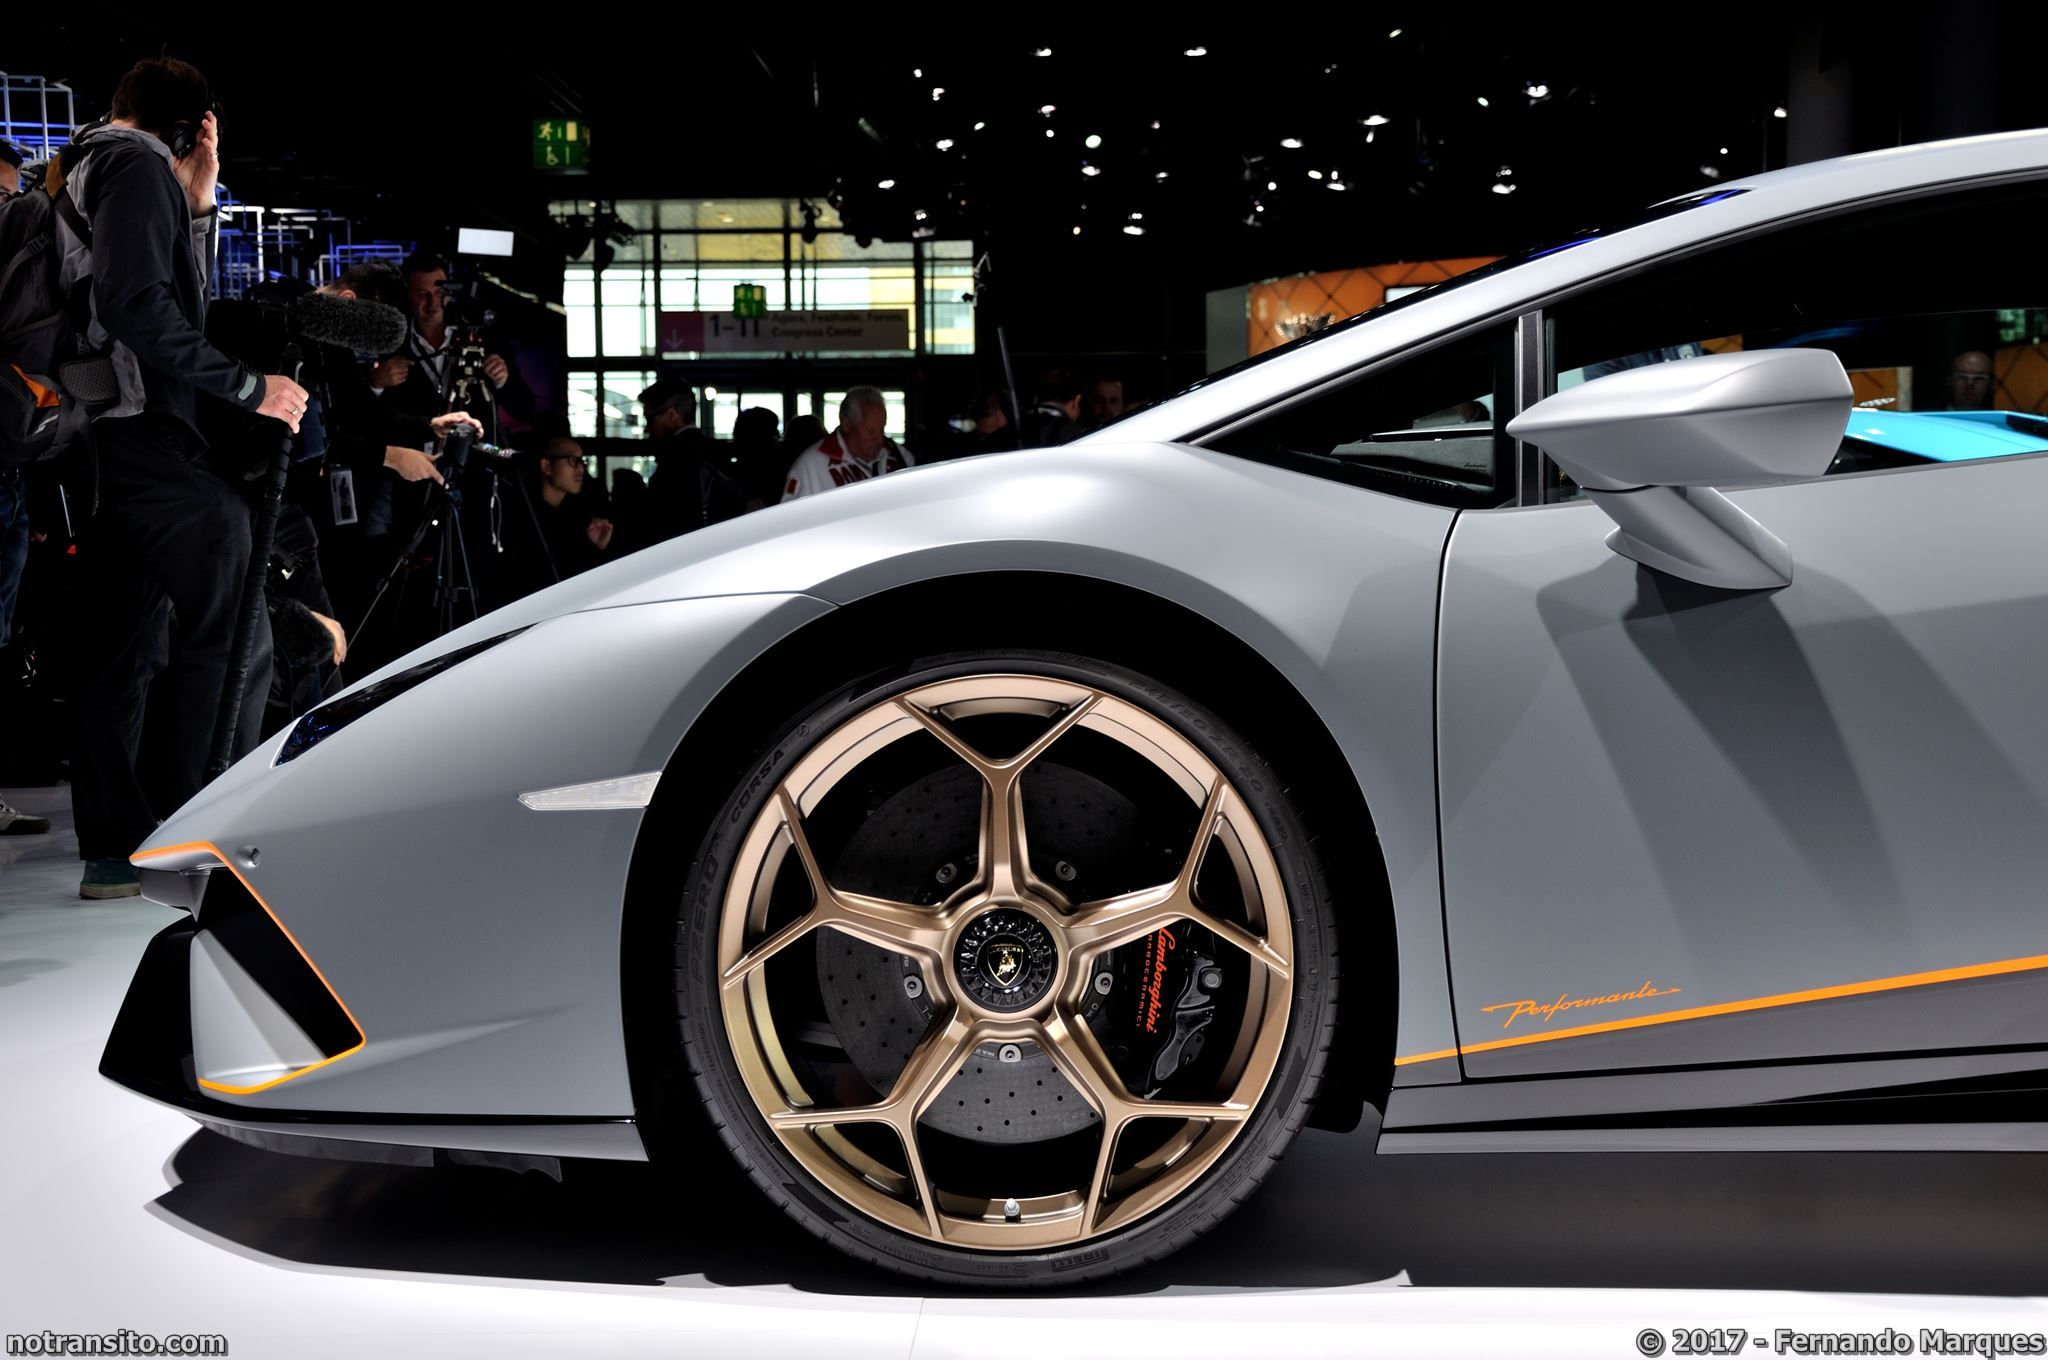 Lamborghini-Huracan-Performante-Frankfurt-2017-005